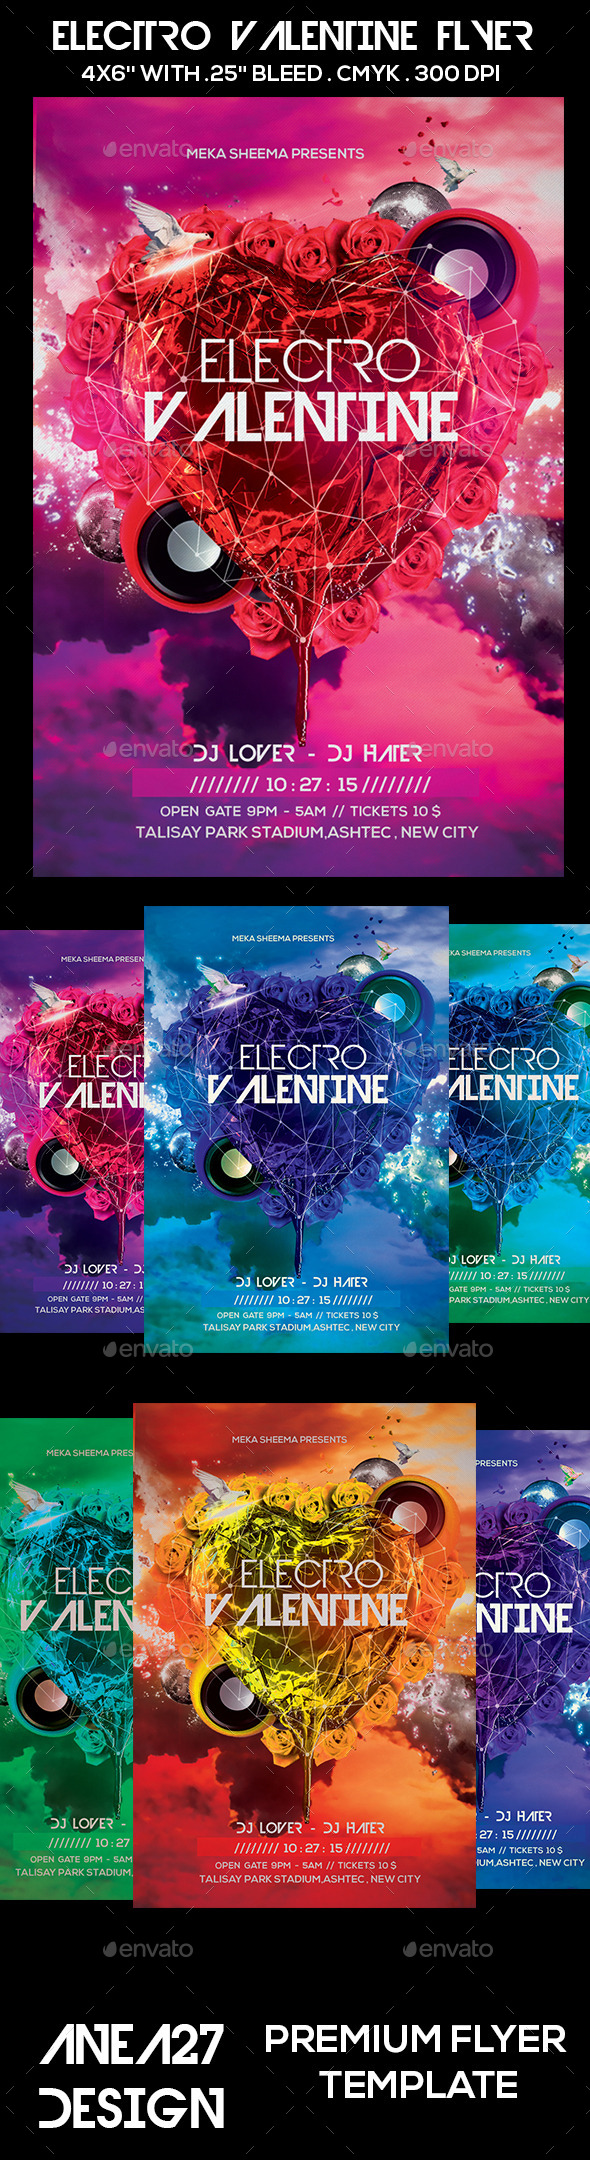 GraphicRiver Electro Valentine Flyer 10269628